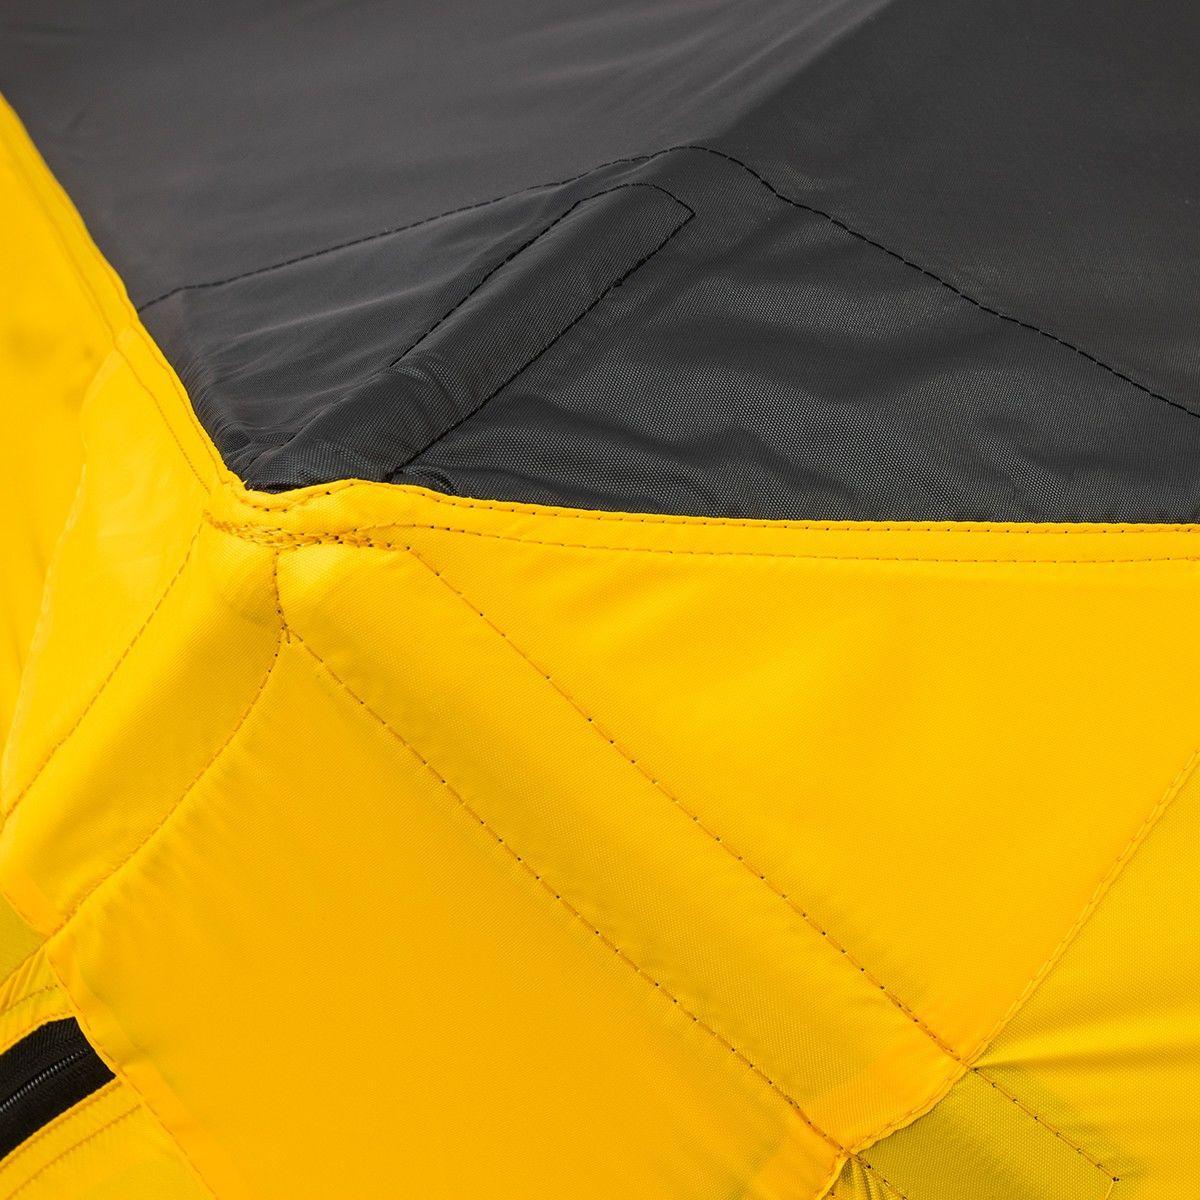 Палатка зимняя КУБ EXTREME 1,5х1,5 v2.0 (широкий вход) Helios 171395 - фото 8